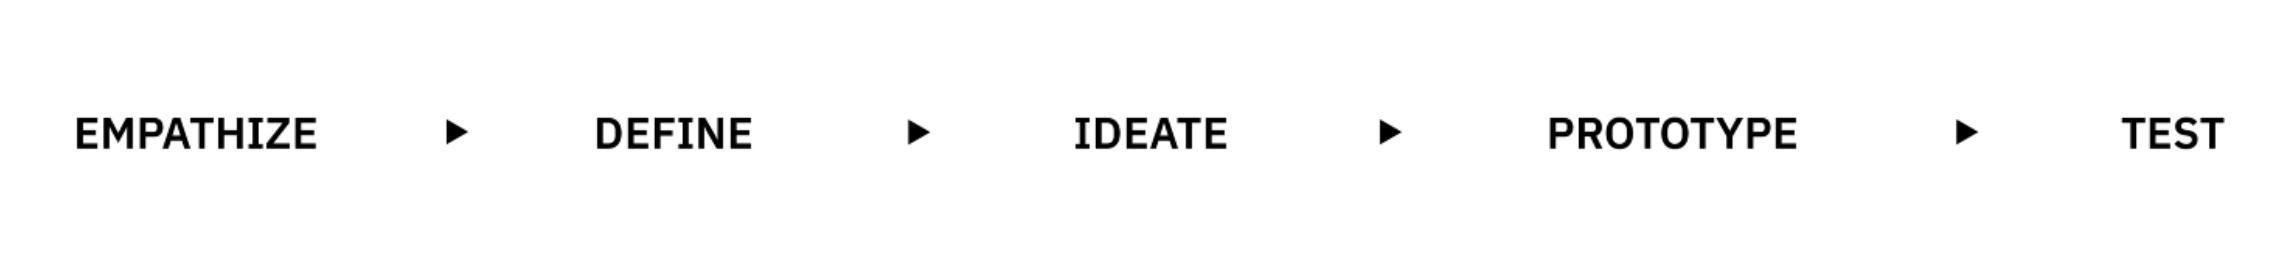 Stanford d.School   's Design Thinking Process